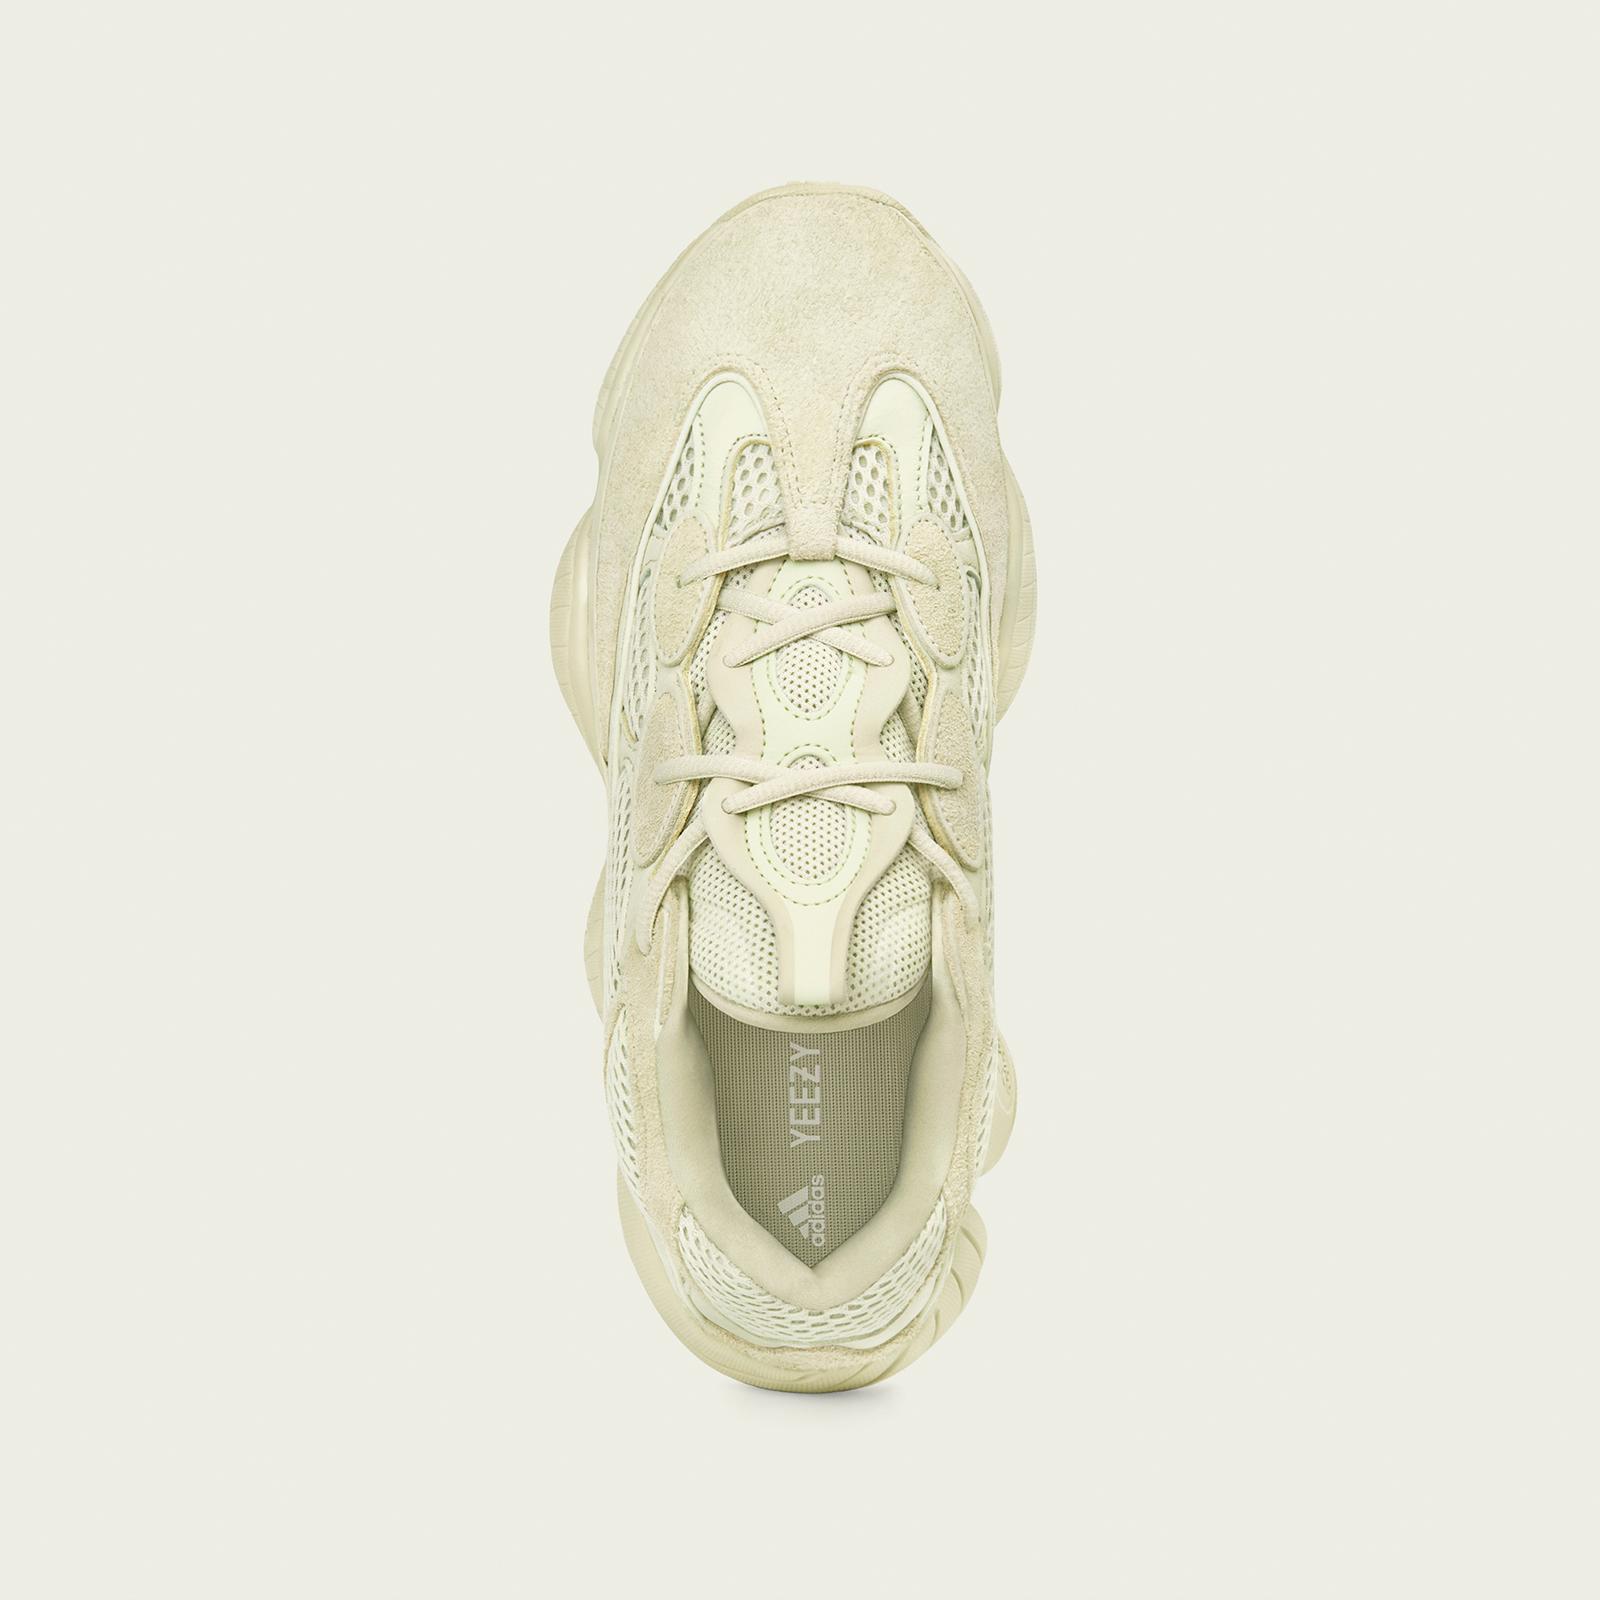 c041908f989 adidas Yeezy 500 - Db2966 - Sneakersnstuff